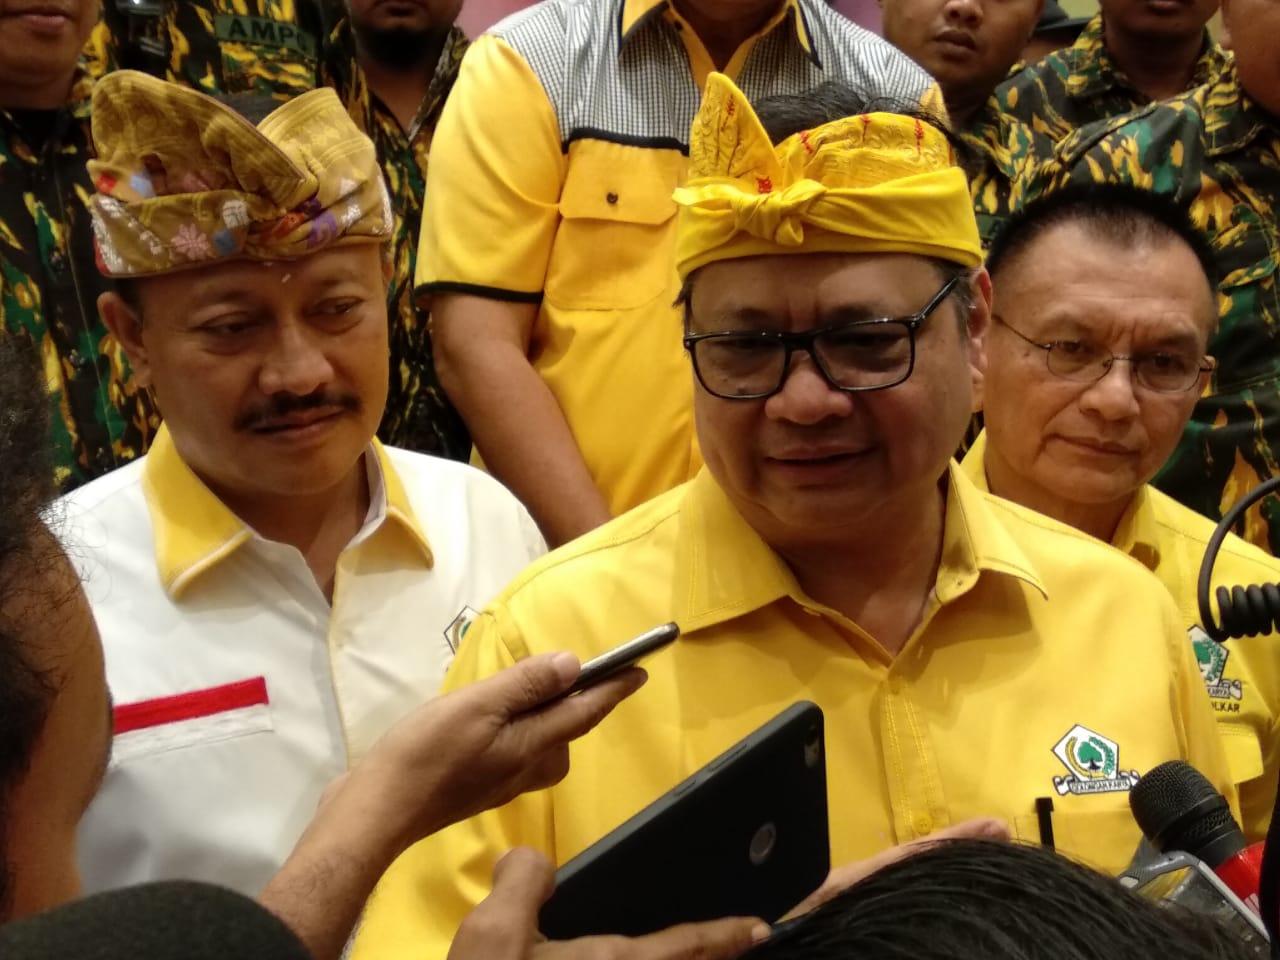 Musda Golkar Bali Digelar 22 Februari 2020, Demer Sudah Kantongi Restu Airlangga